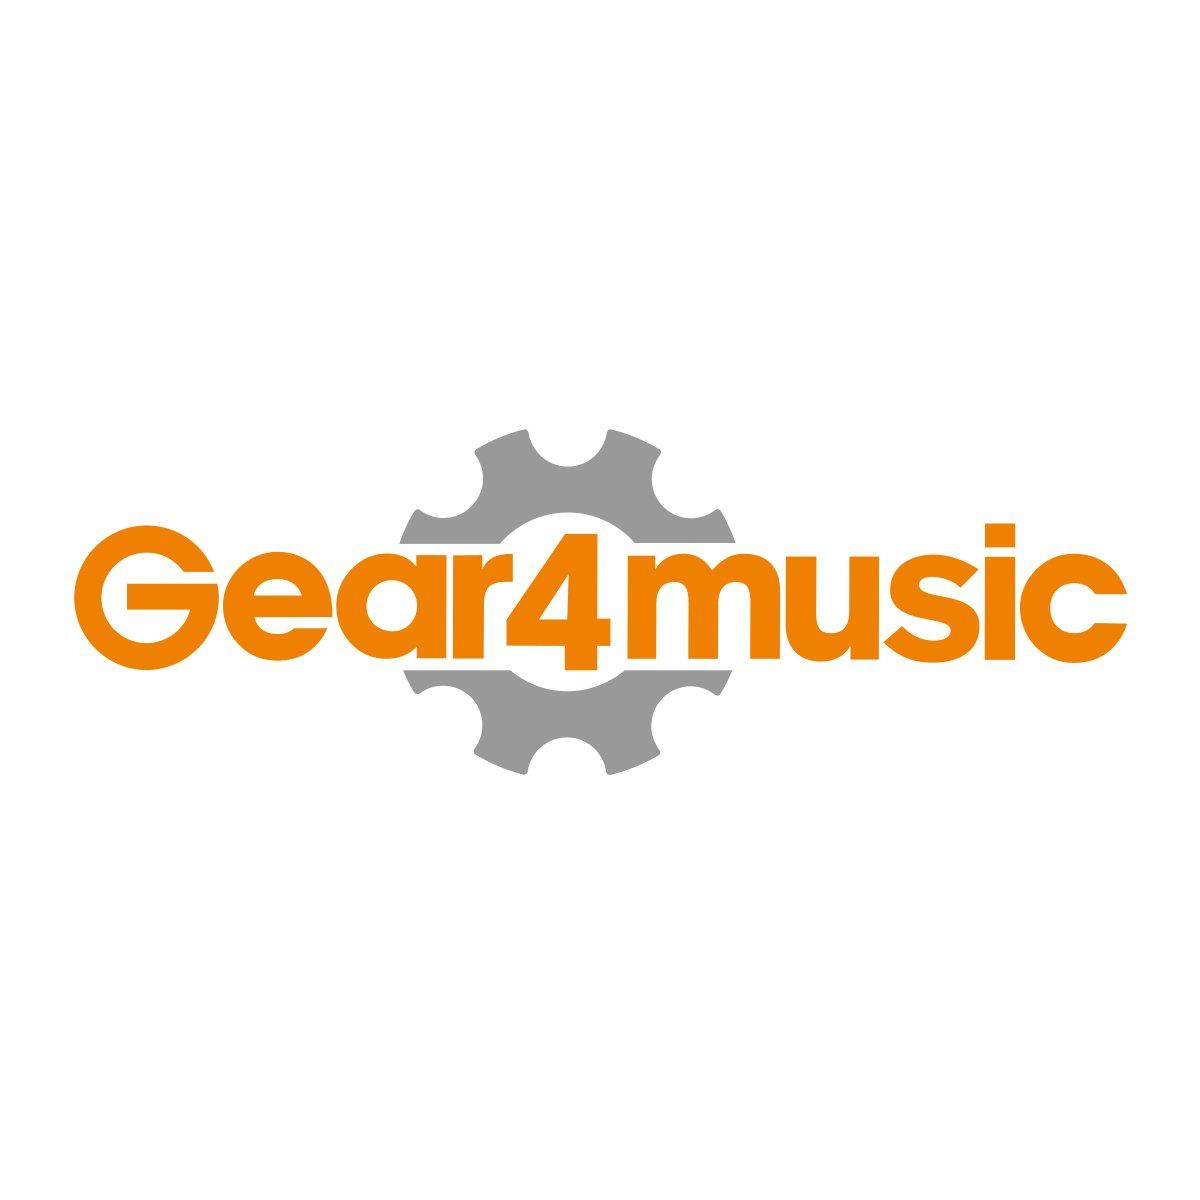 5 String Banjo by Gear4music